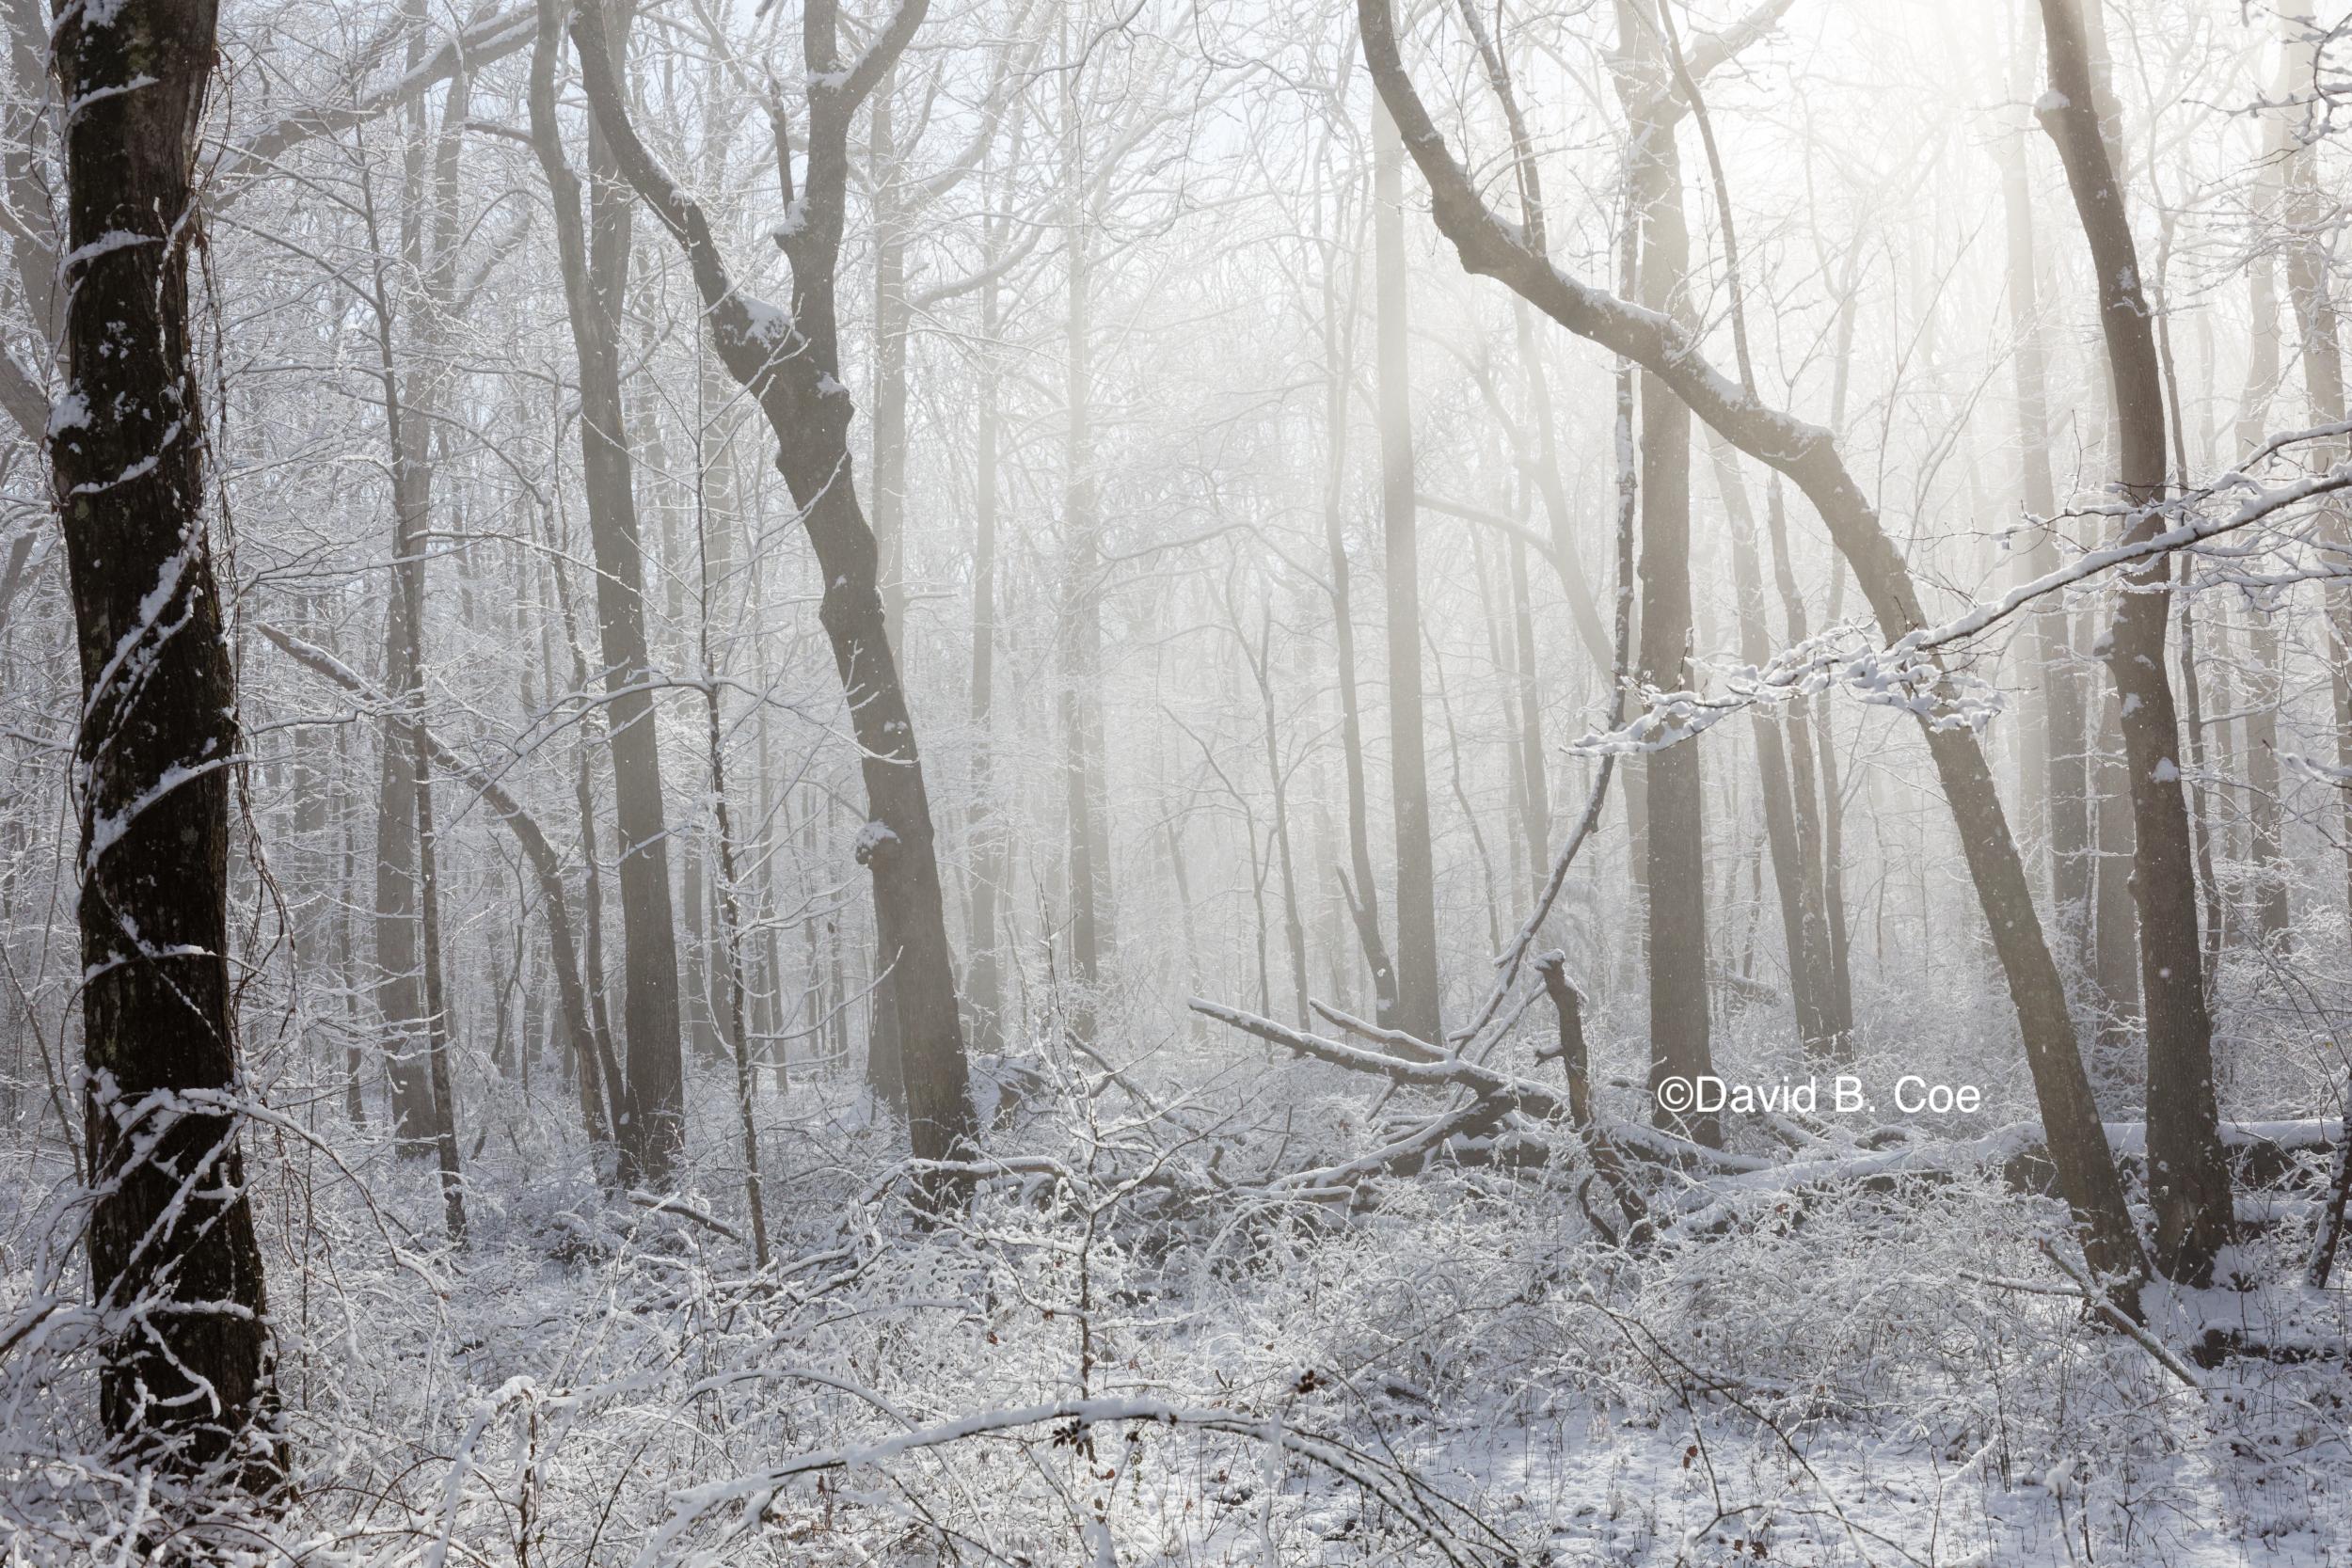 Snow and Mist II, by David B. Coe